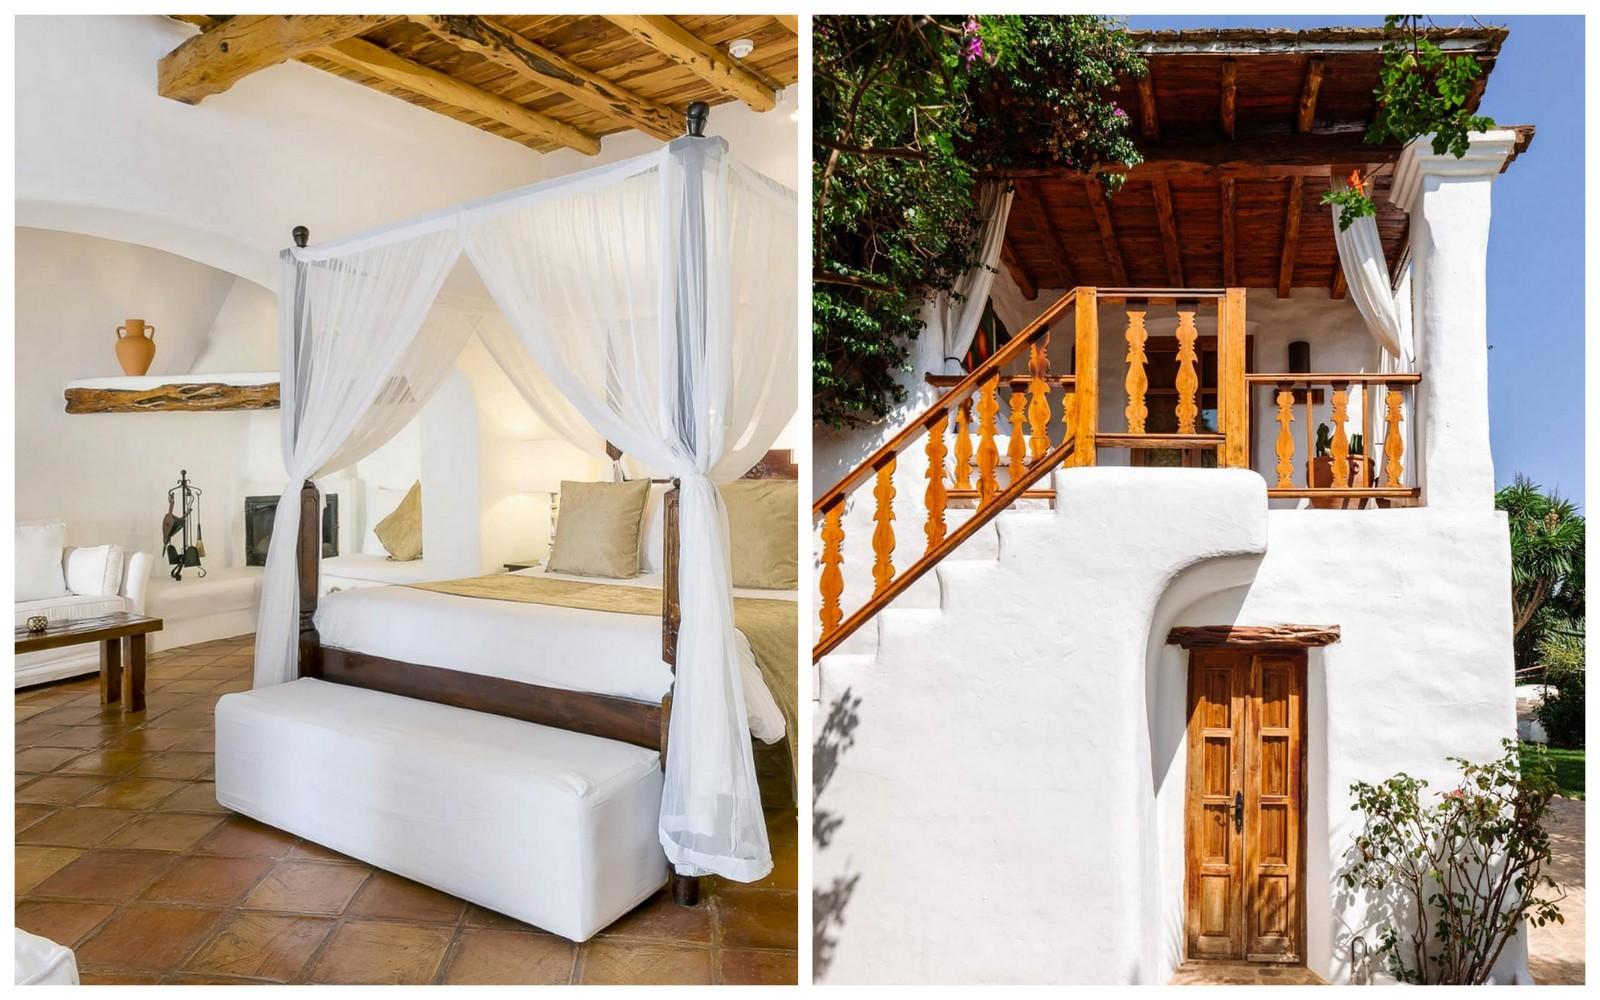 ibiza,hotel,atzaro,agroturismo,spa,bougainvilliers,déco,palmiers,travel,travel guide,espagne,île d'ibiza,où dormir à ibiza